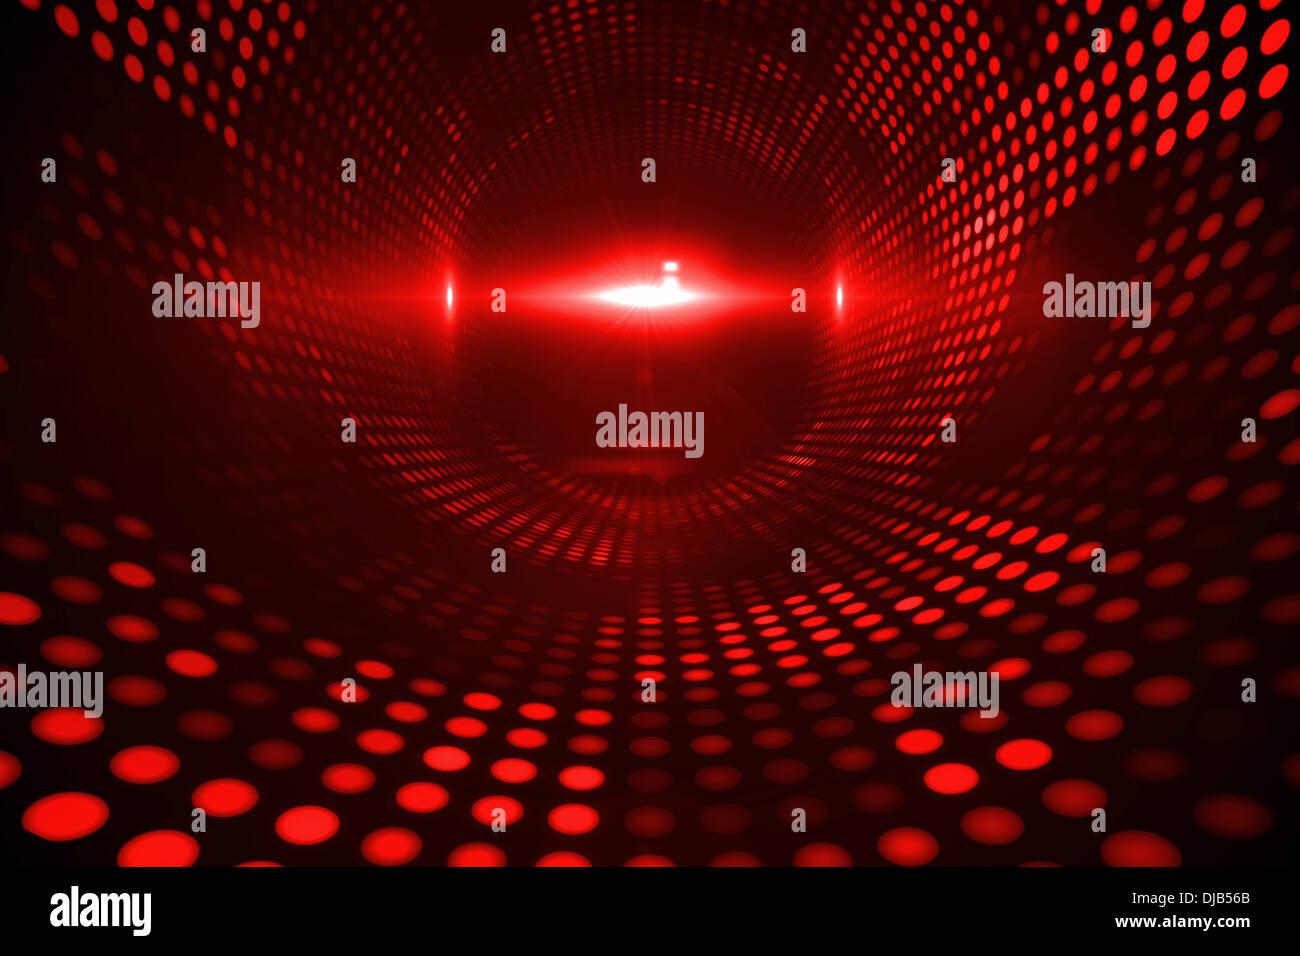 Shiny Red Dots On Black Background Stock Photo 62940483 Alamy